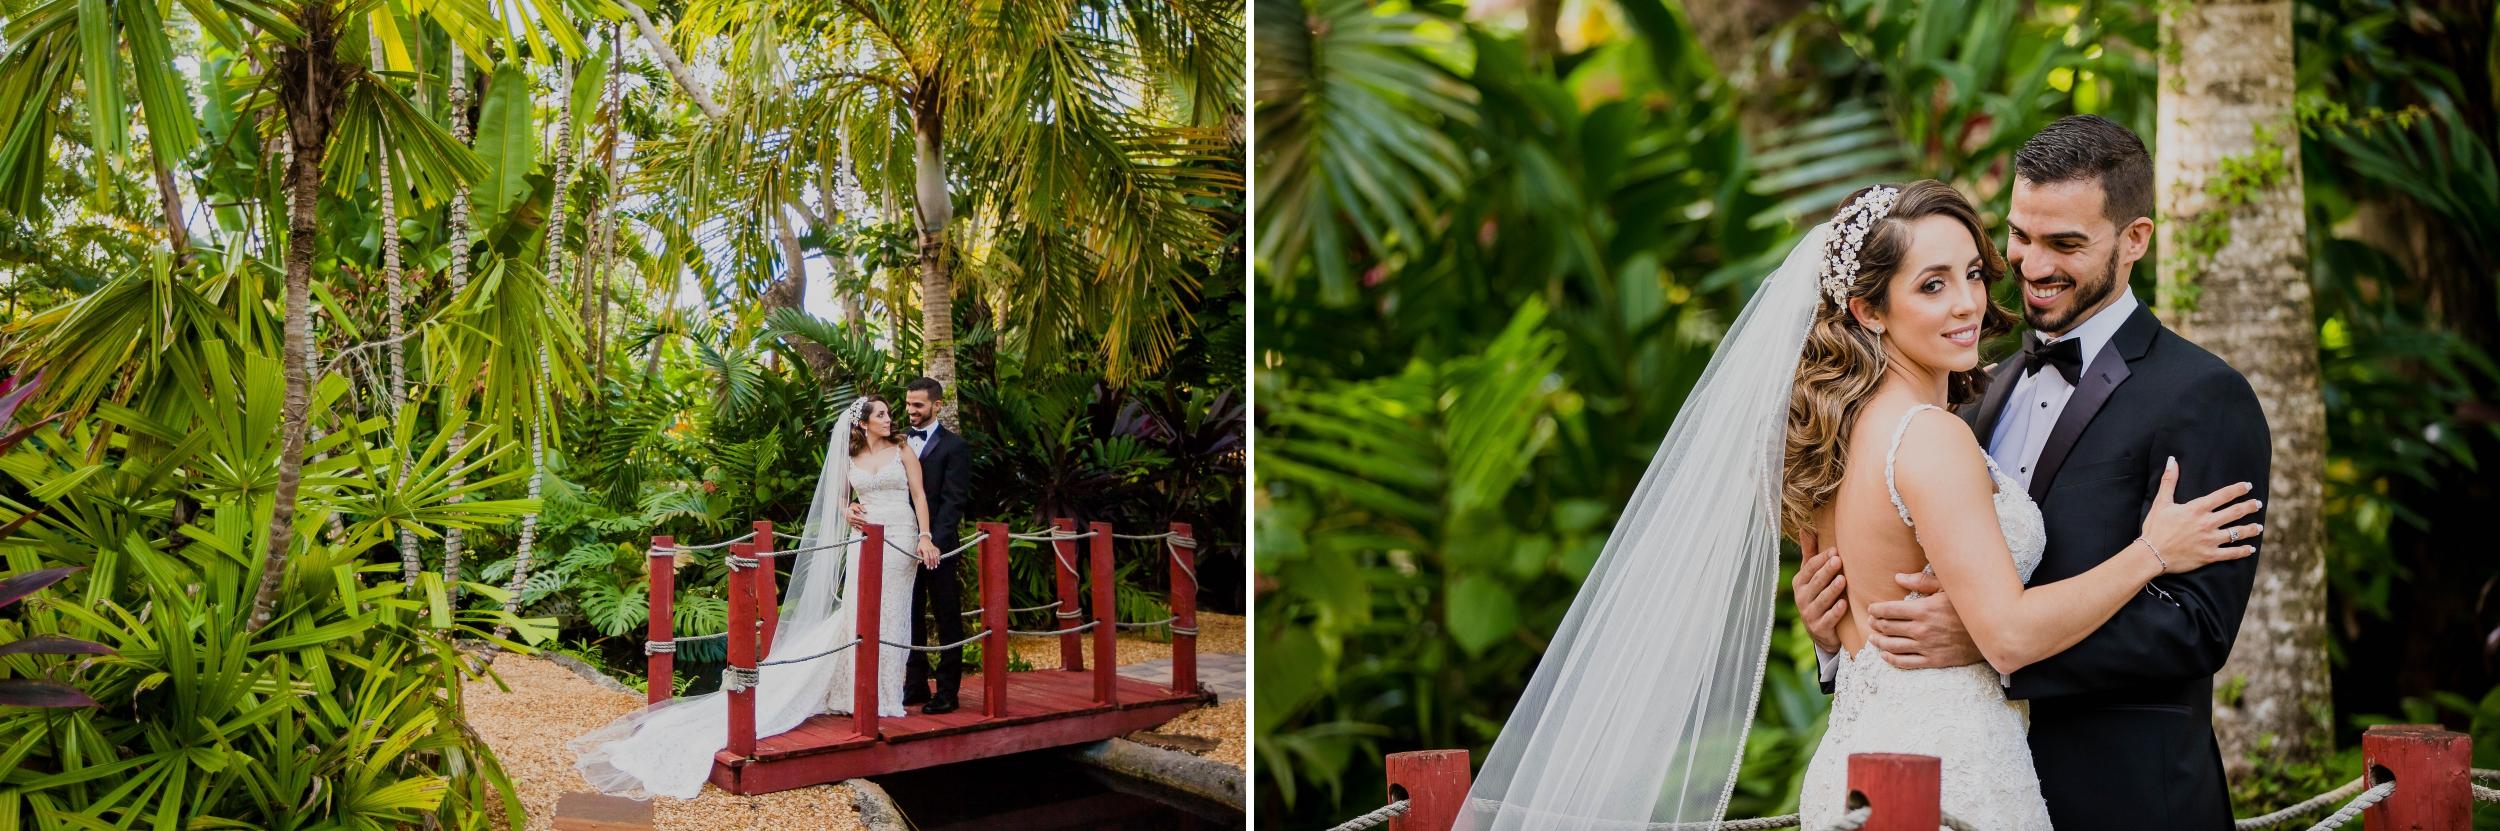 Wedding Miller Plantation Photography by Santy Martinez 14.jpg